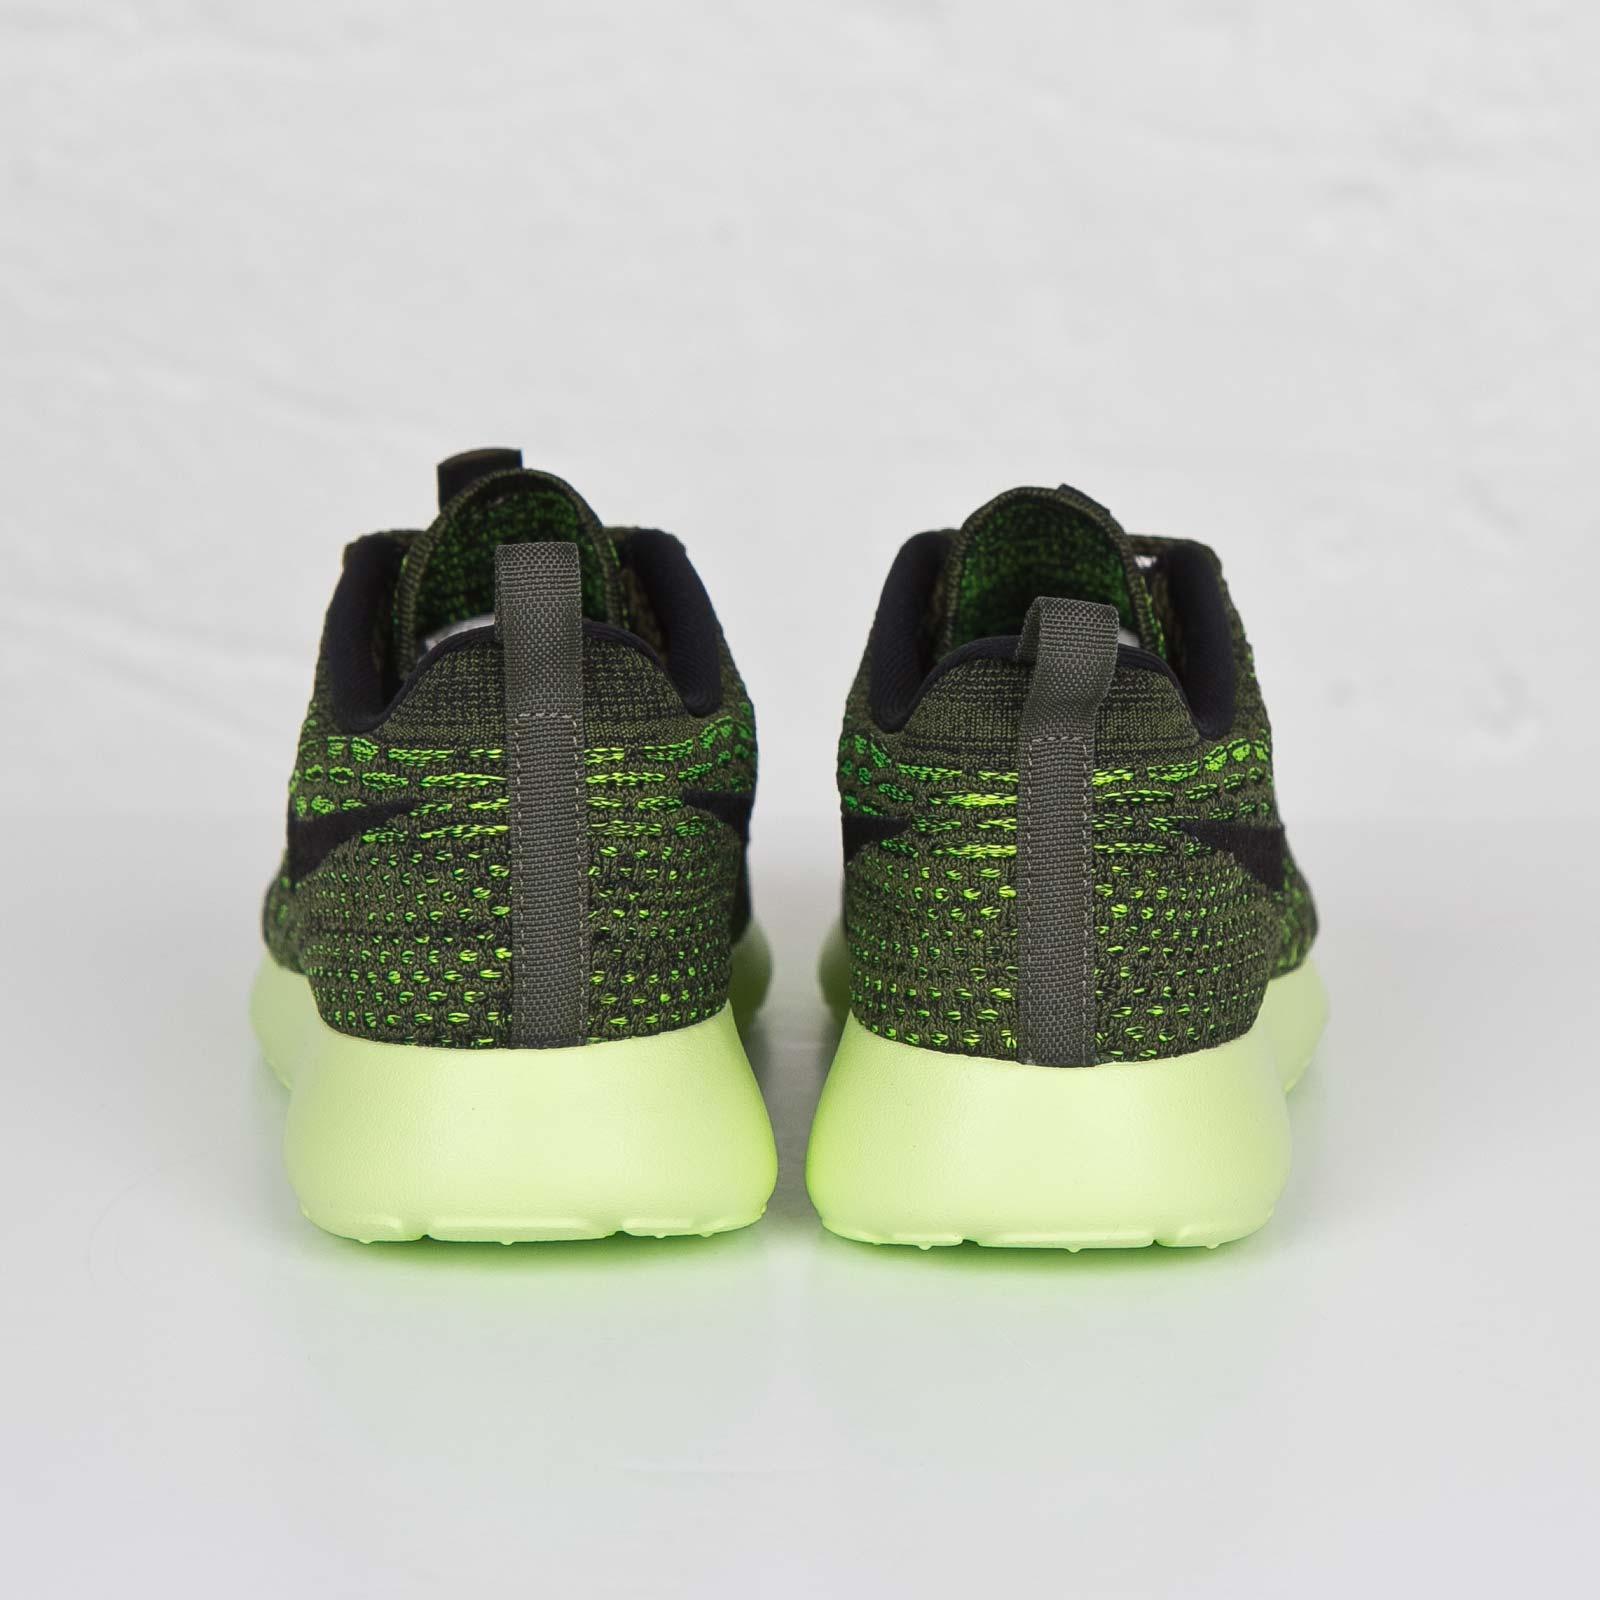 16b4f77efb396 Nike Wmns Roshe One Flyknit - 704927-301 - Sneakersnstuff